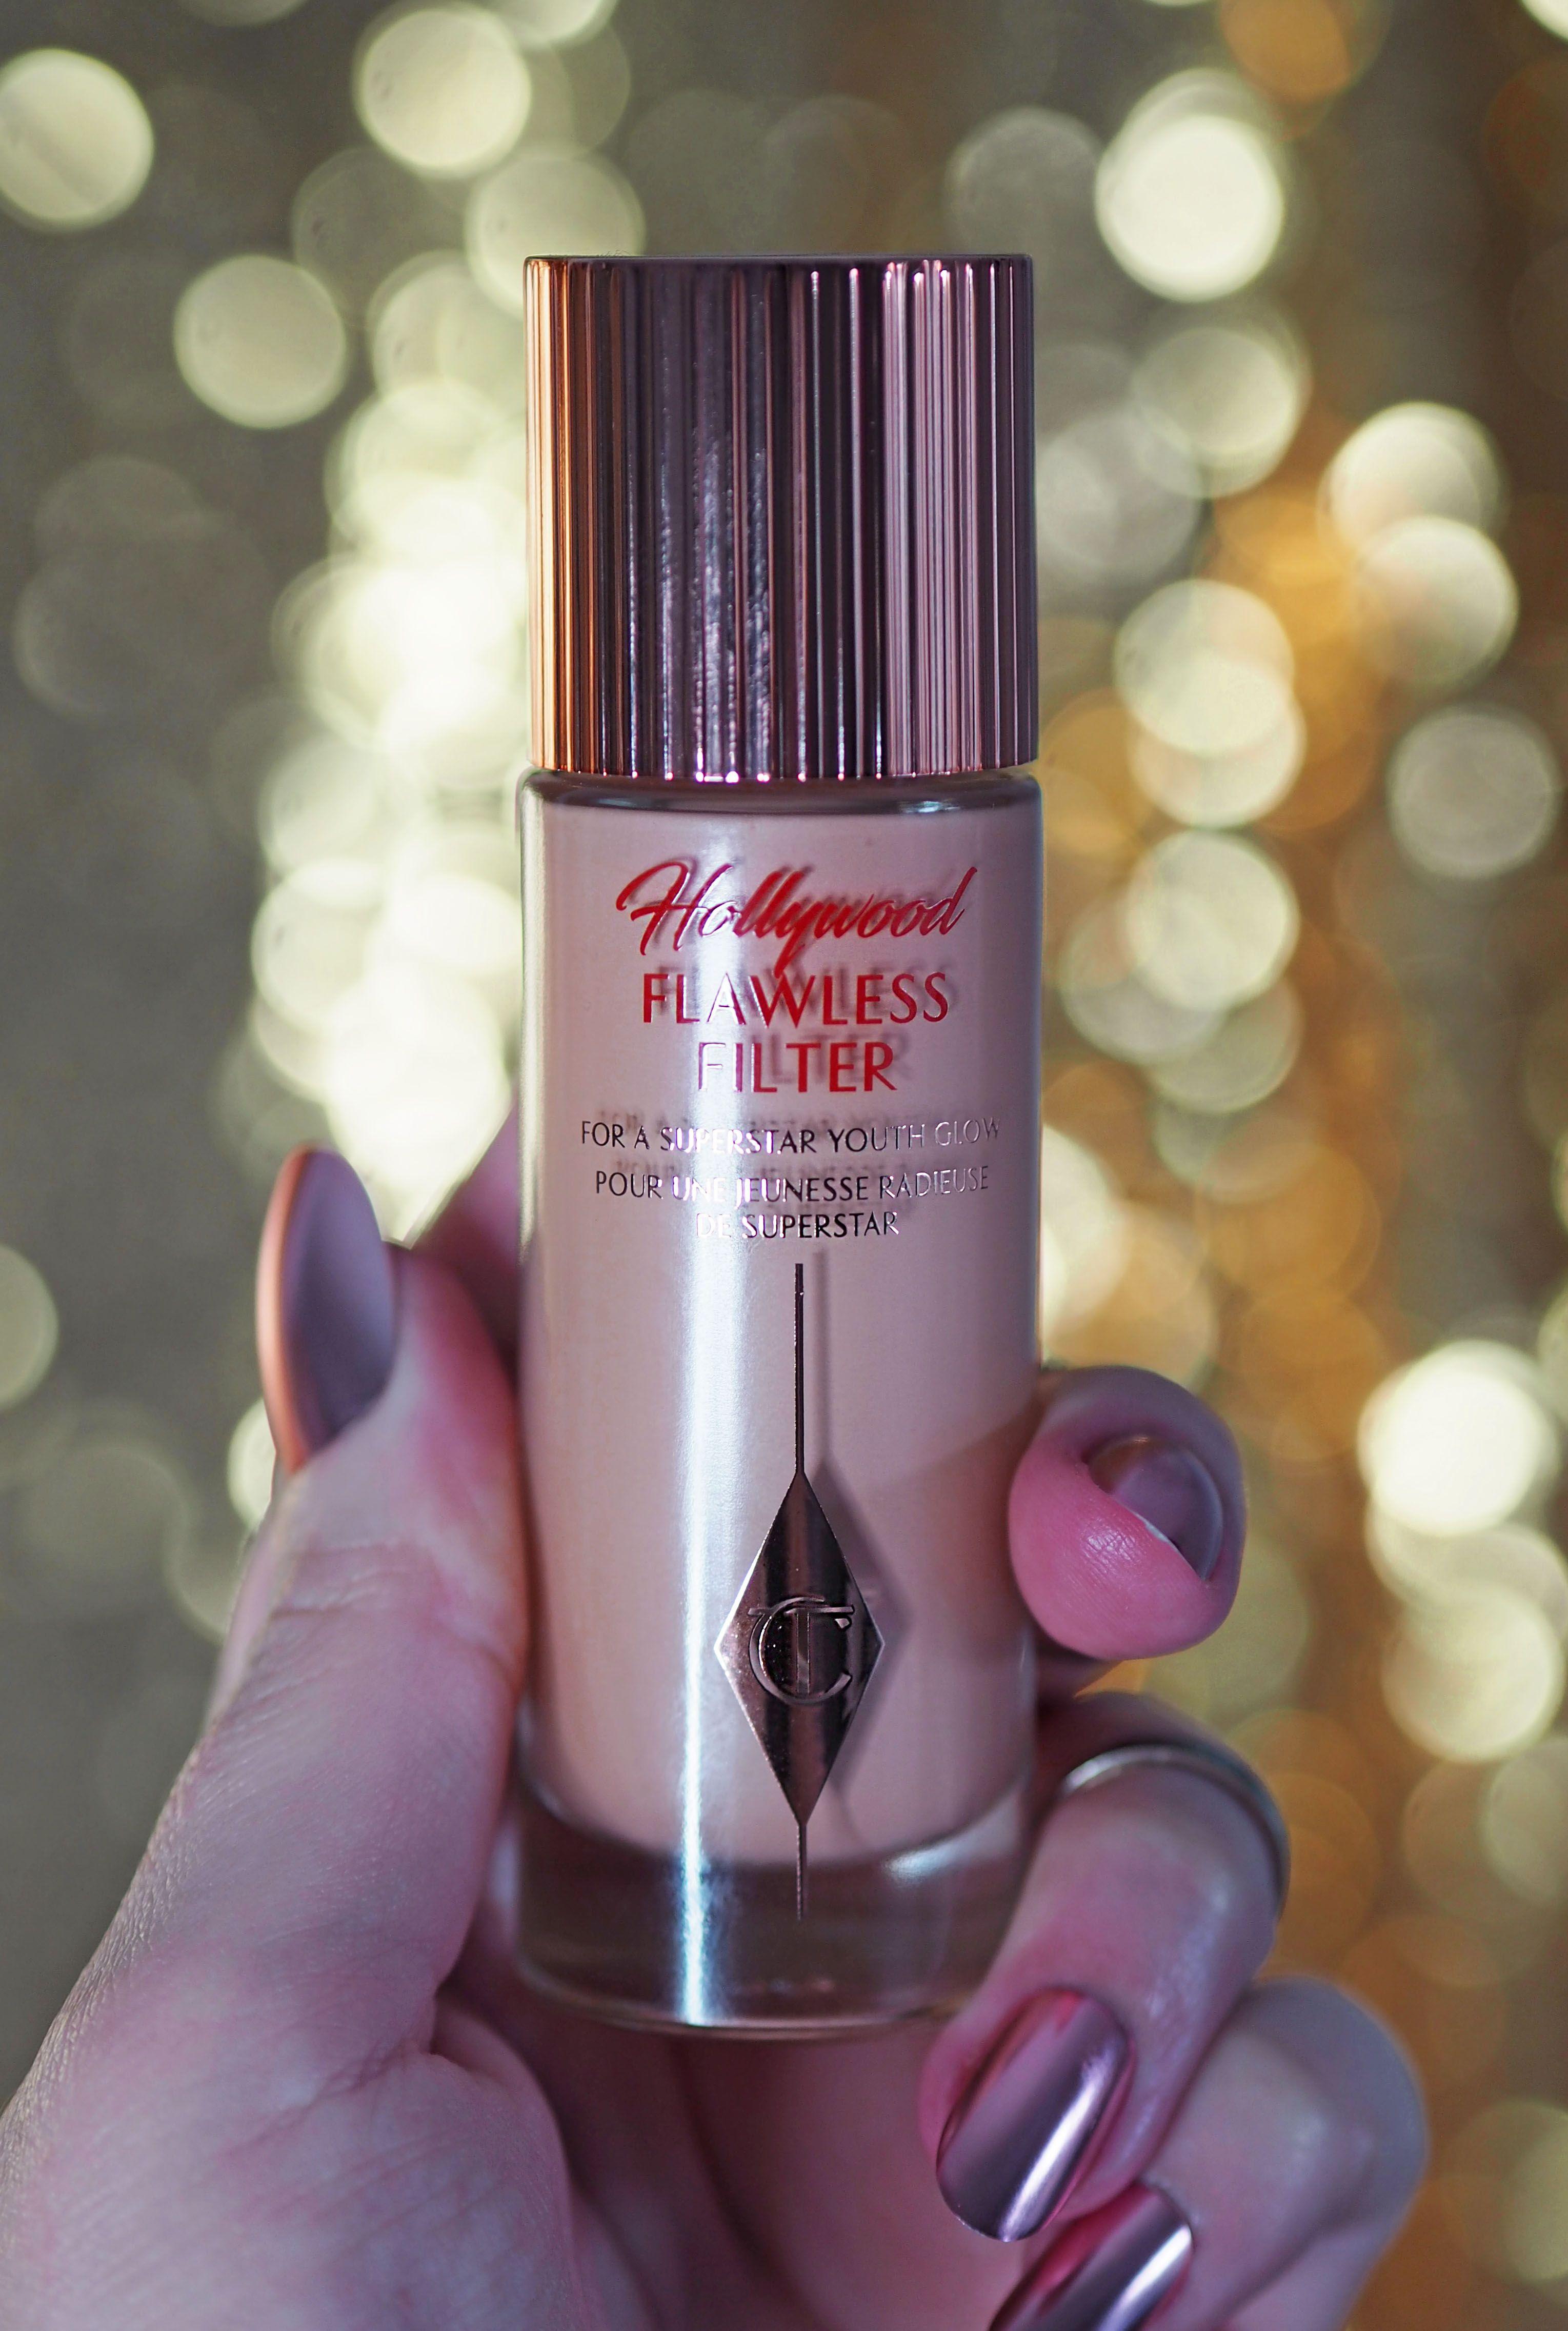 My Top 6 Pixi Skincare Picks. Beauty makeup, Nail polish